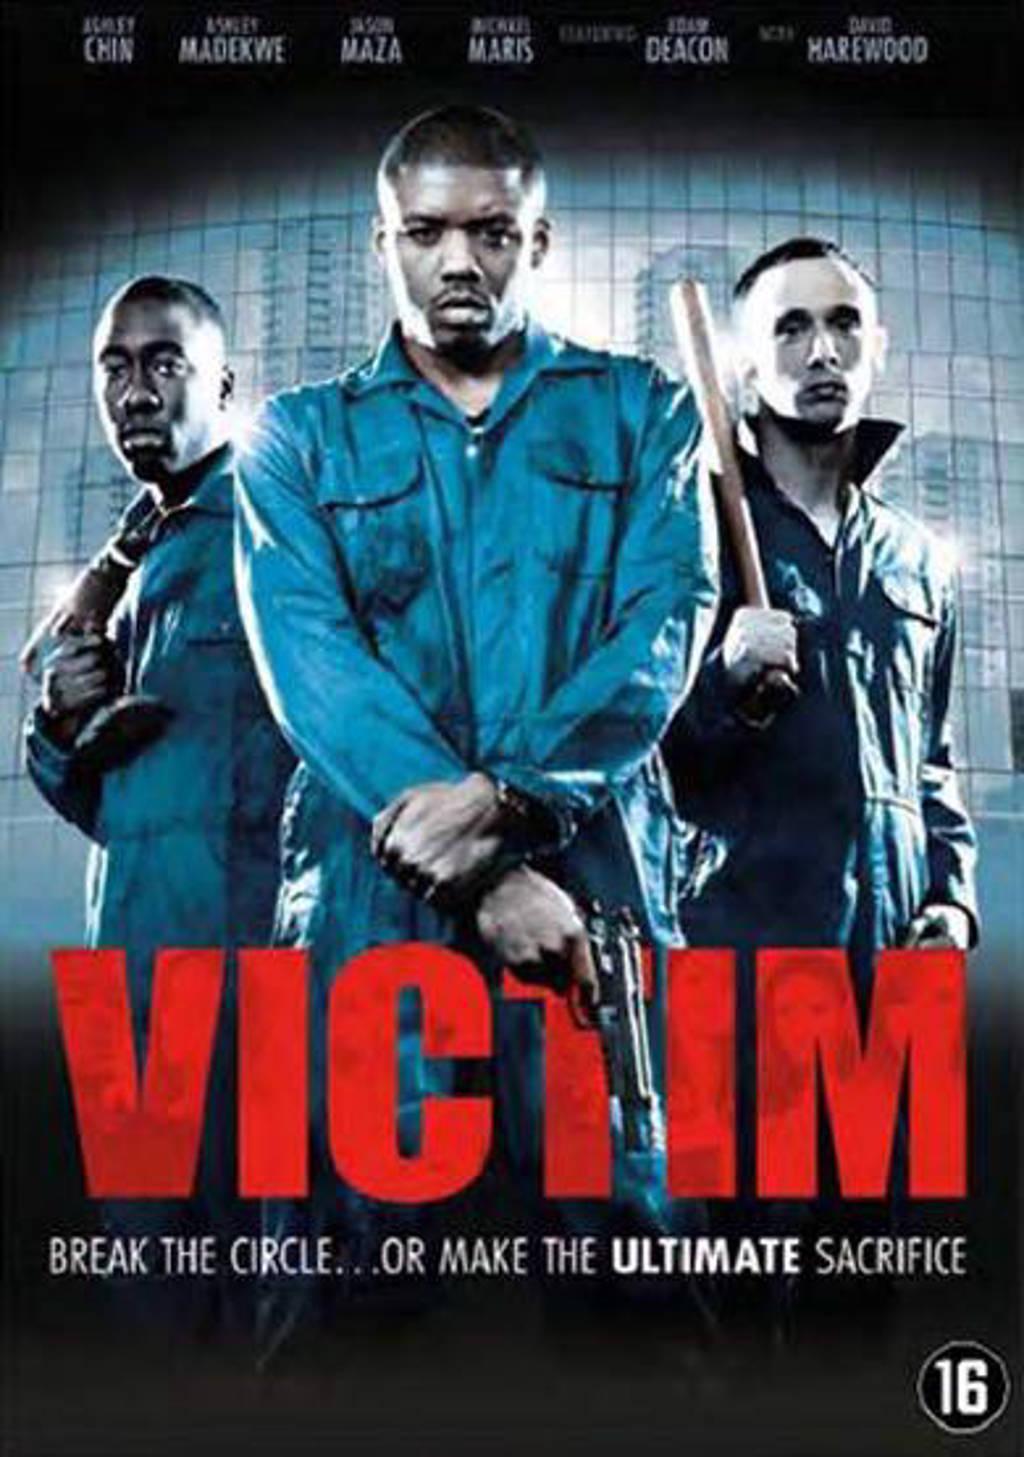 Victim (DVD)